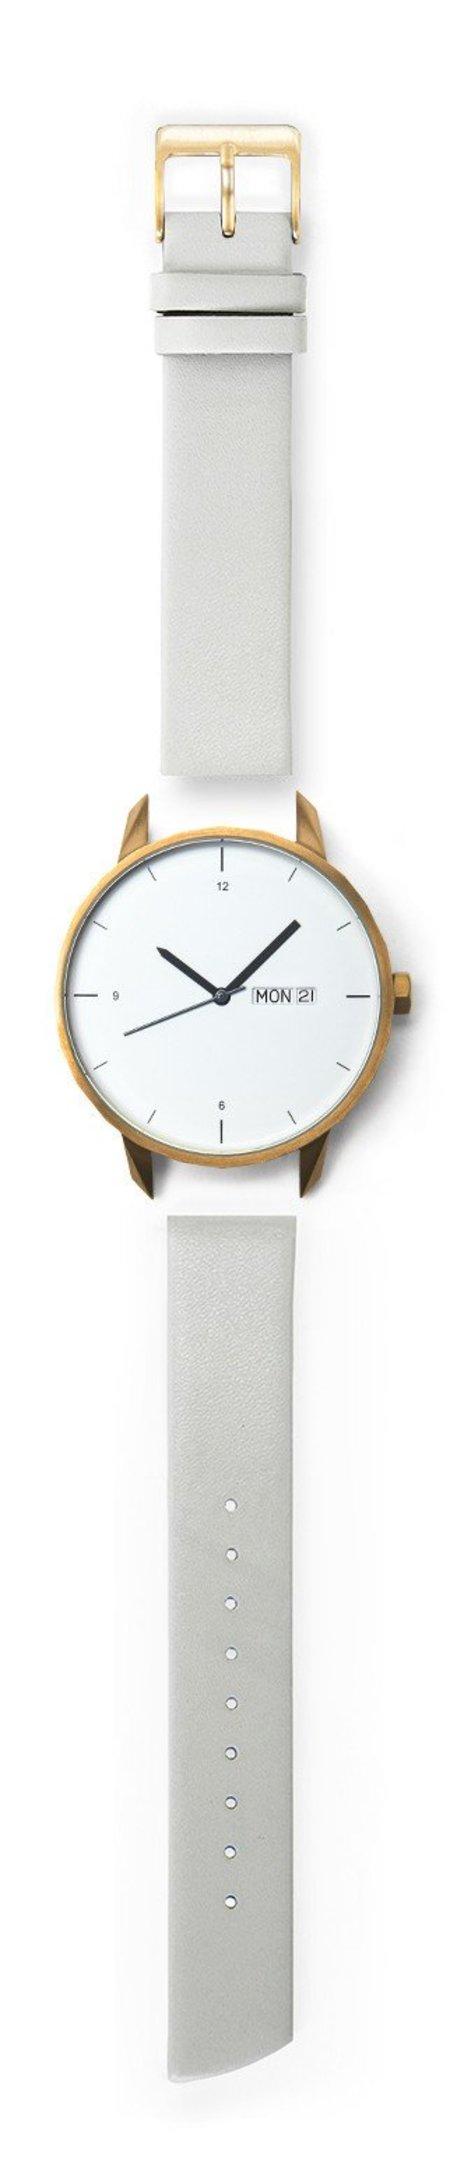 Unisex Tinker Watches 42mm Gold Watch Grey Strap